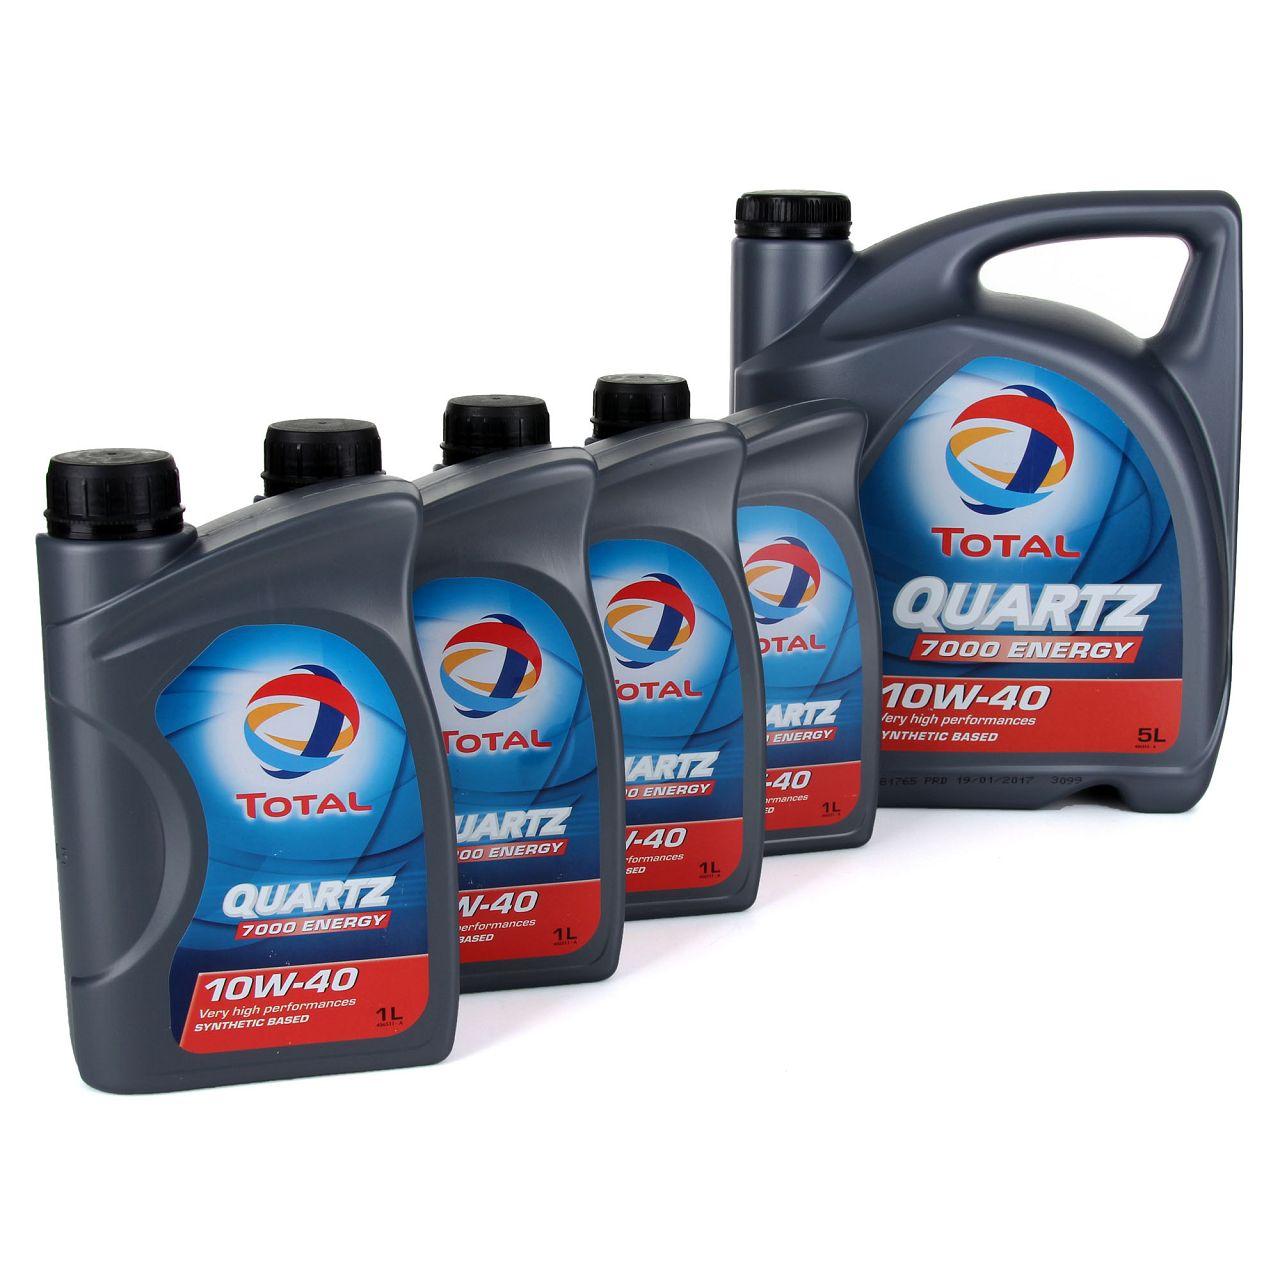 TOTAL QUARTZ 7000 ENERGY Motoröl Öl 10W-40 10W40 VW 501.01/505.00 - 9L 9 Liter